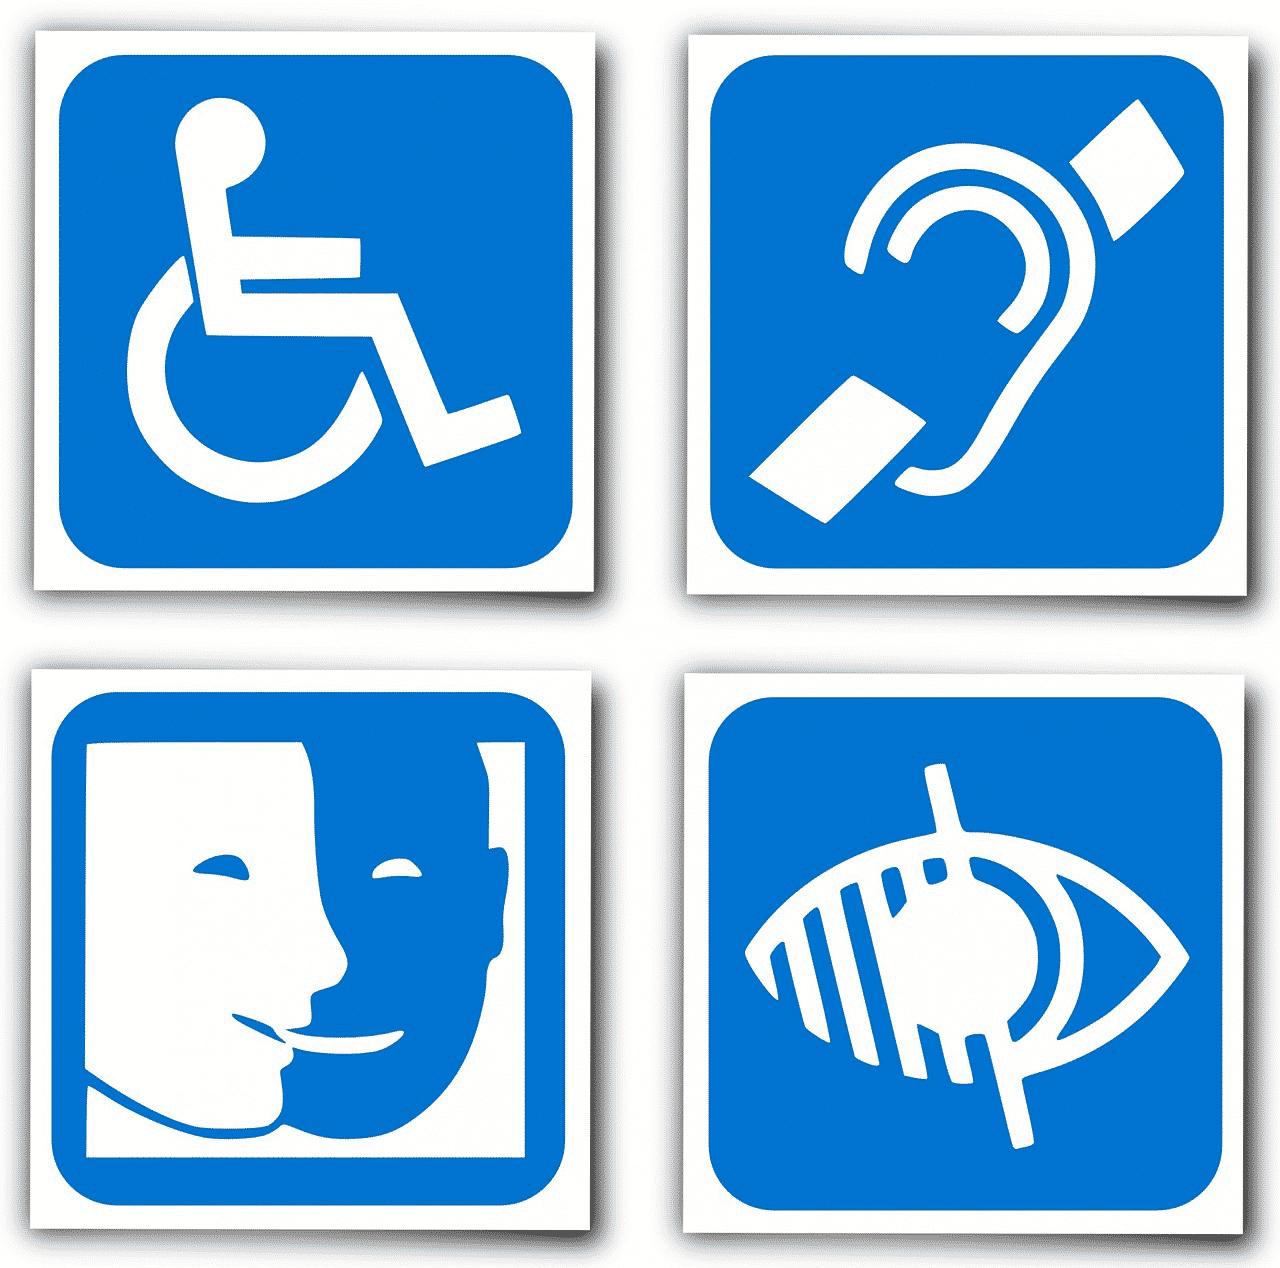 vakom-formation-personne-situation-handicap-1